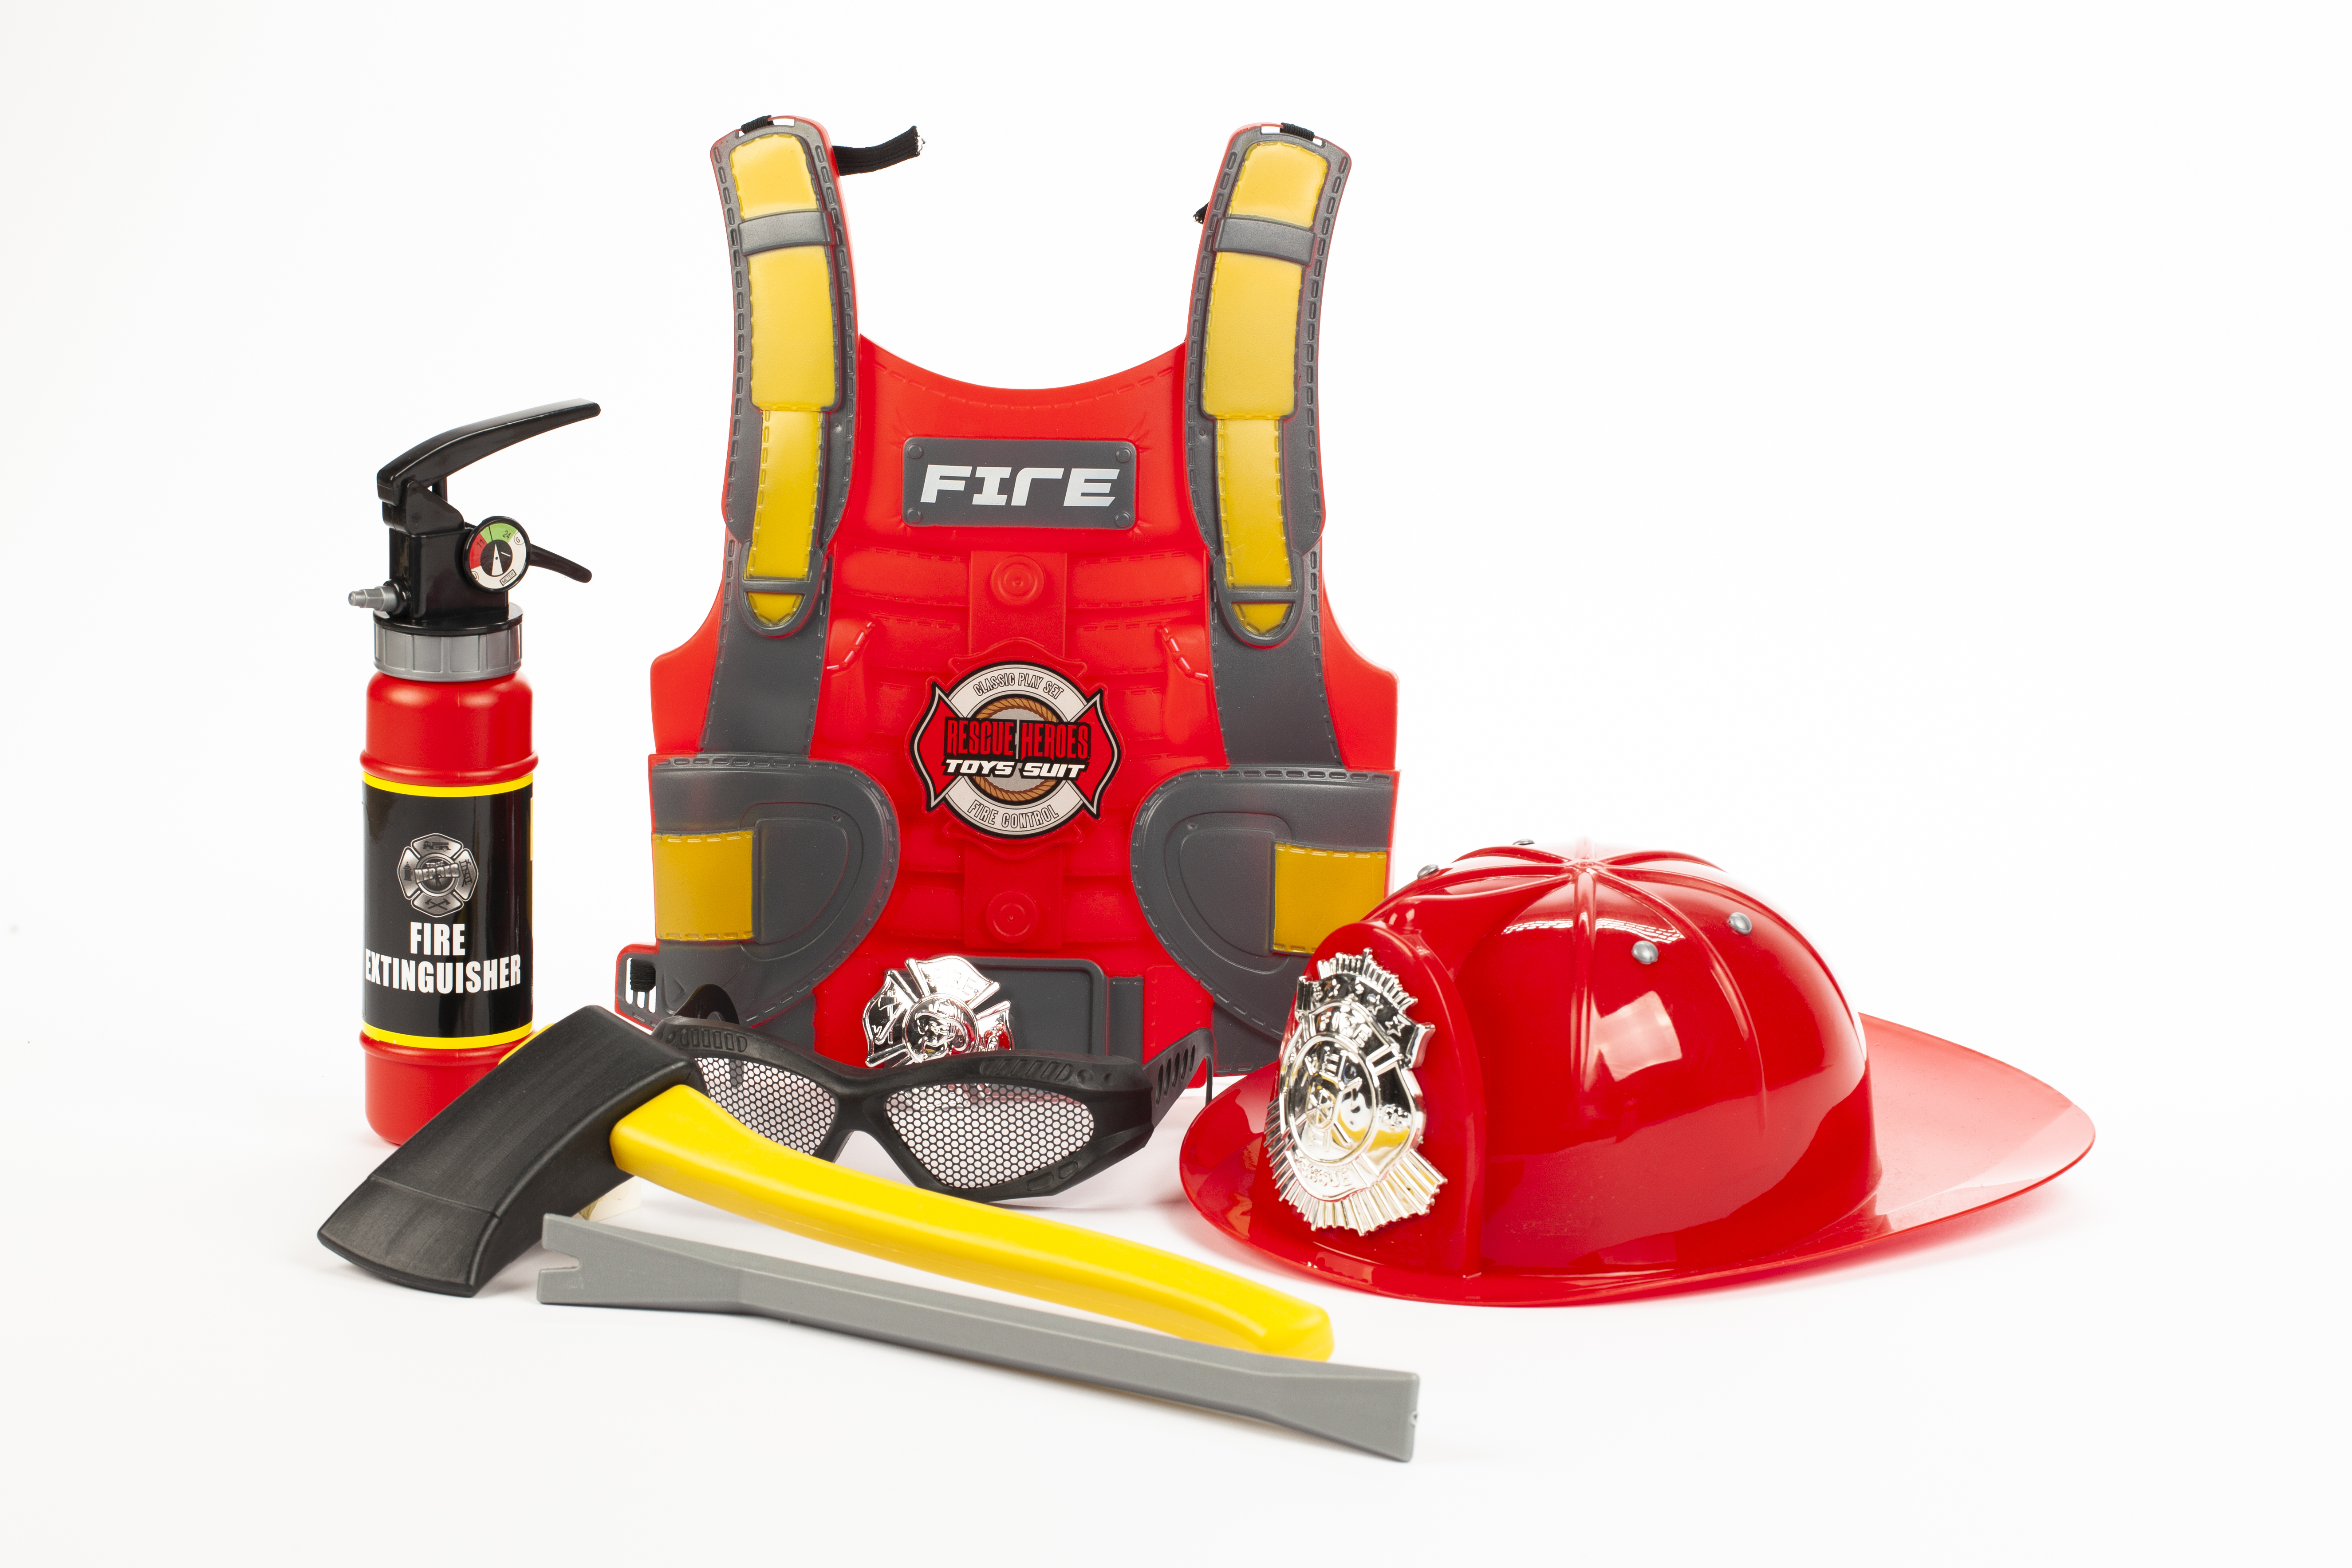 Firefighter Set - Large Box (520356)